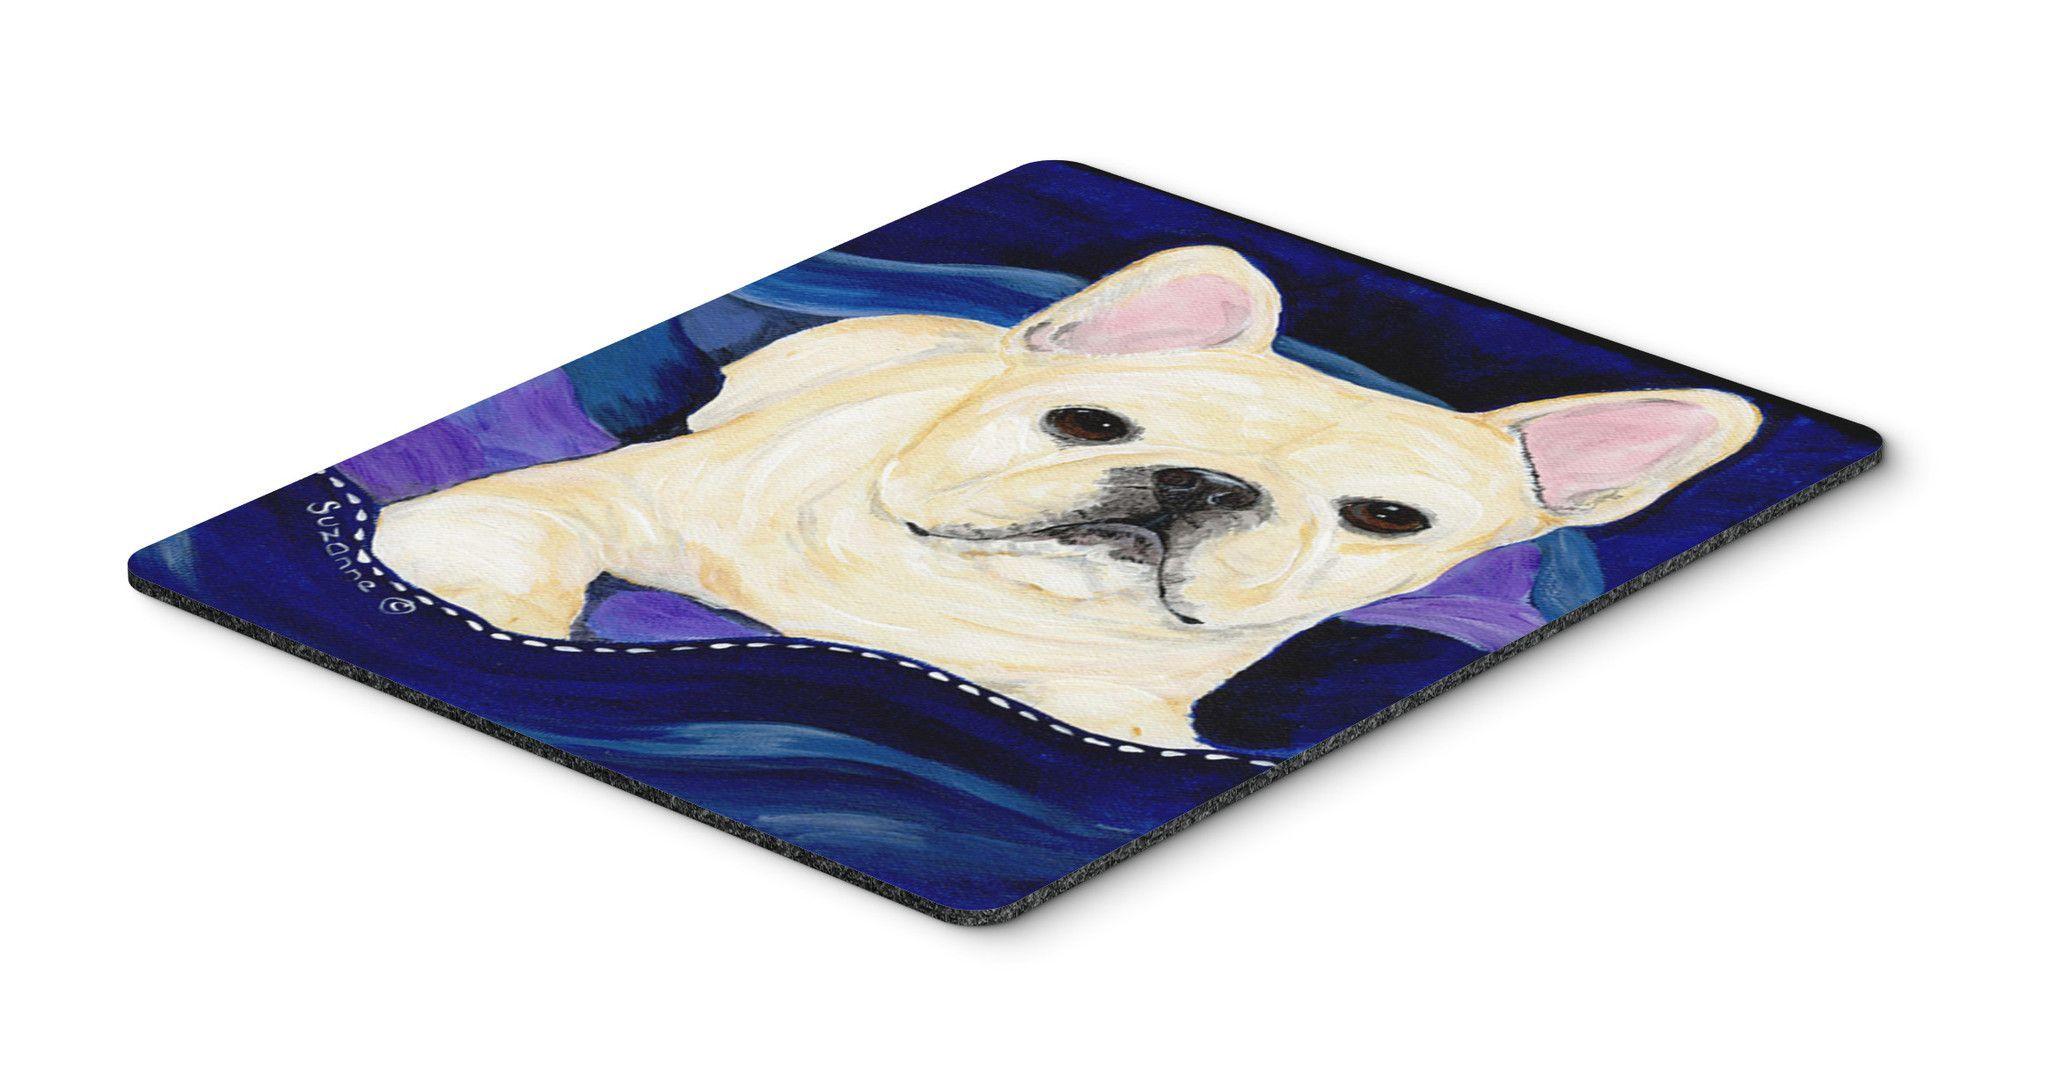 French Bulldog Mouse Pad / Hot Pad / Trivet